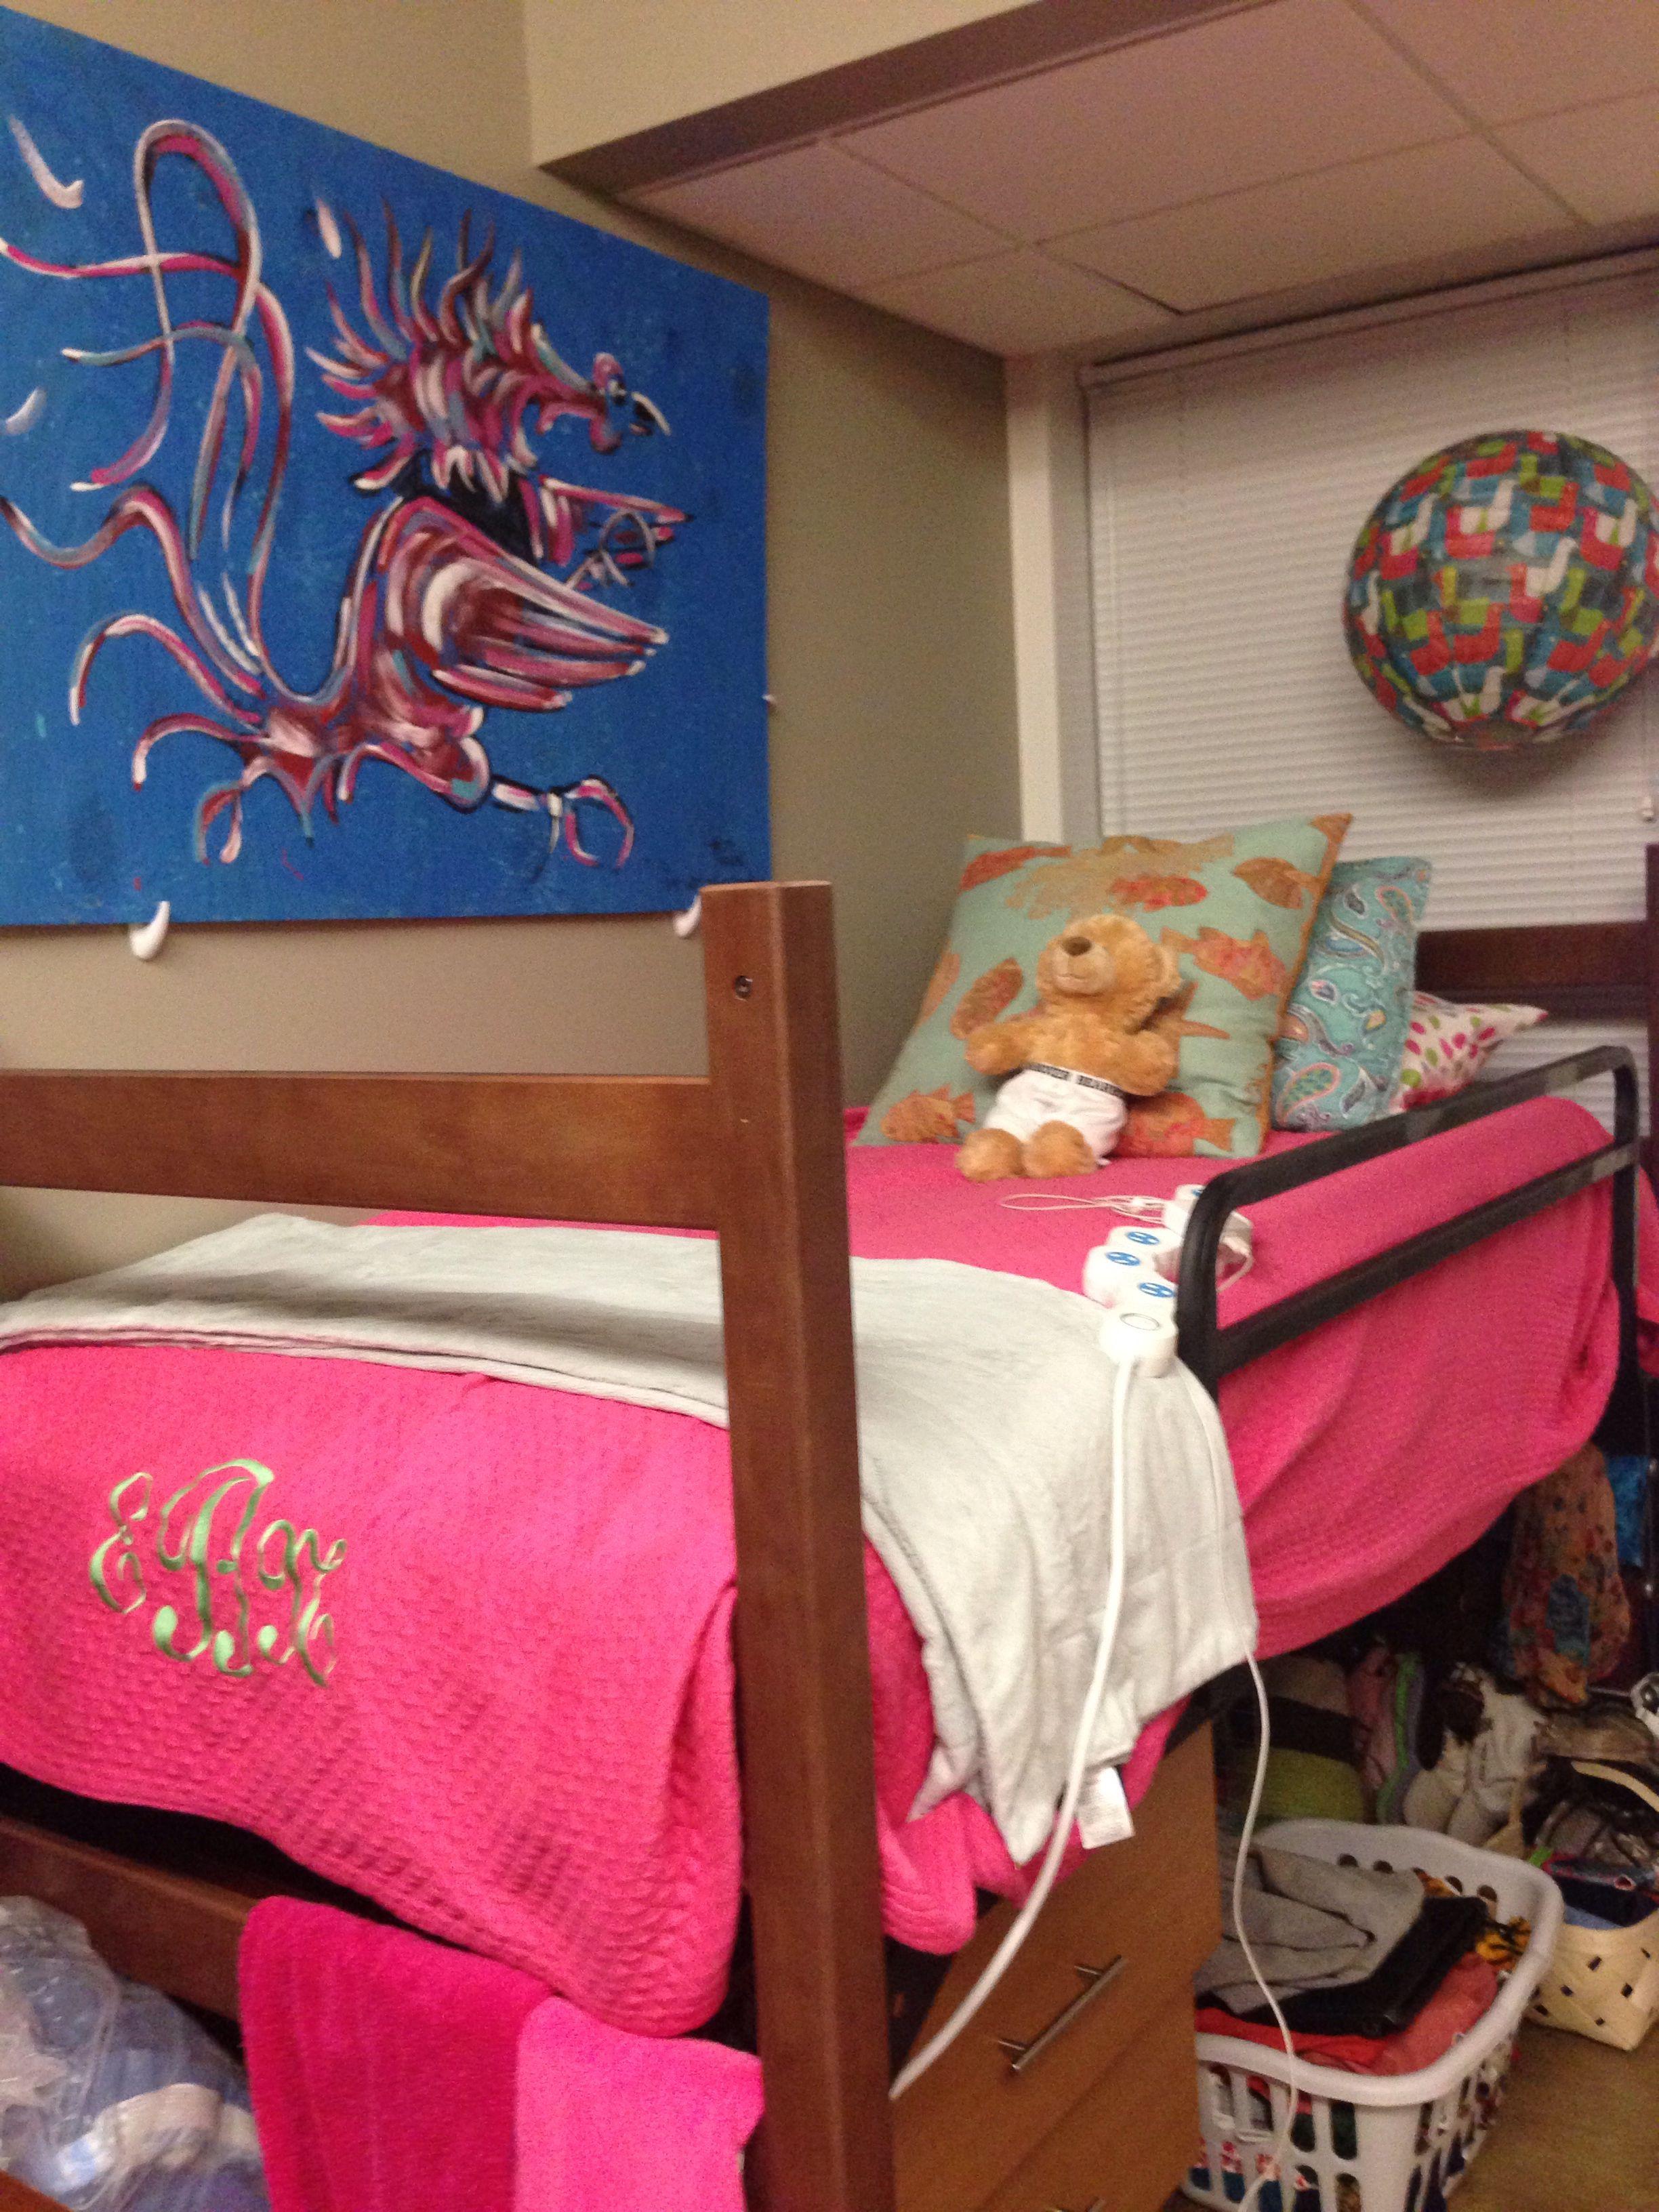 South Carolina Patterson Hall dorm